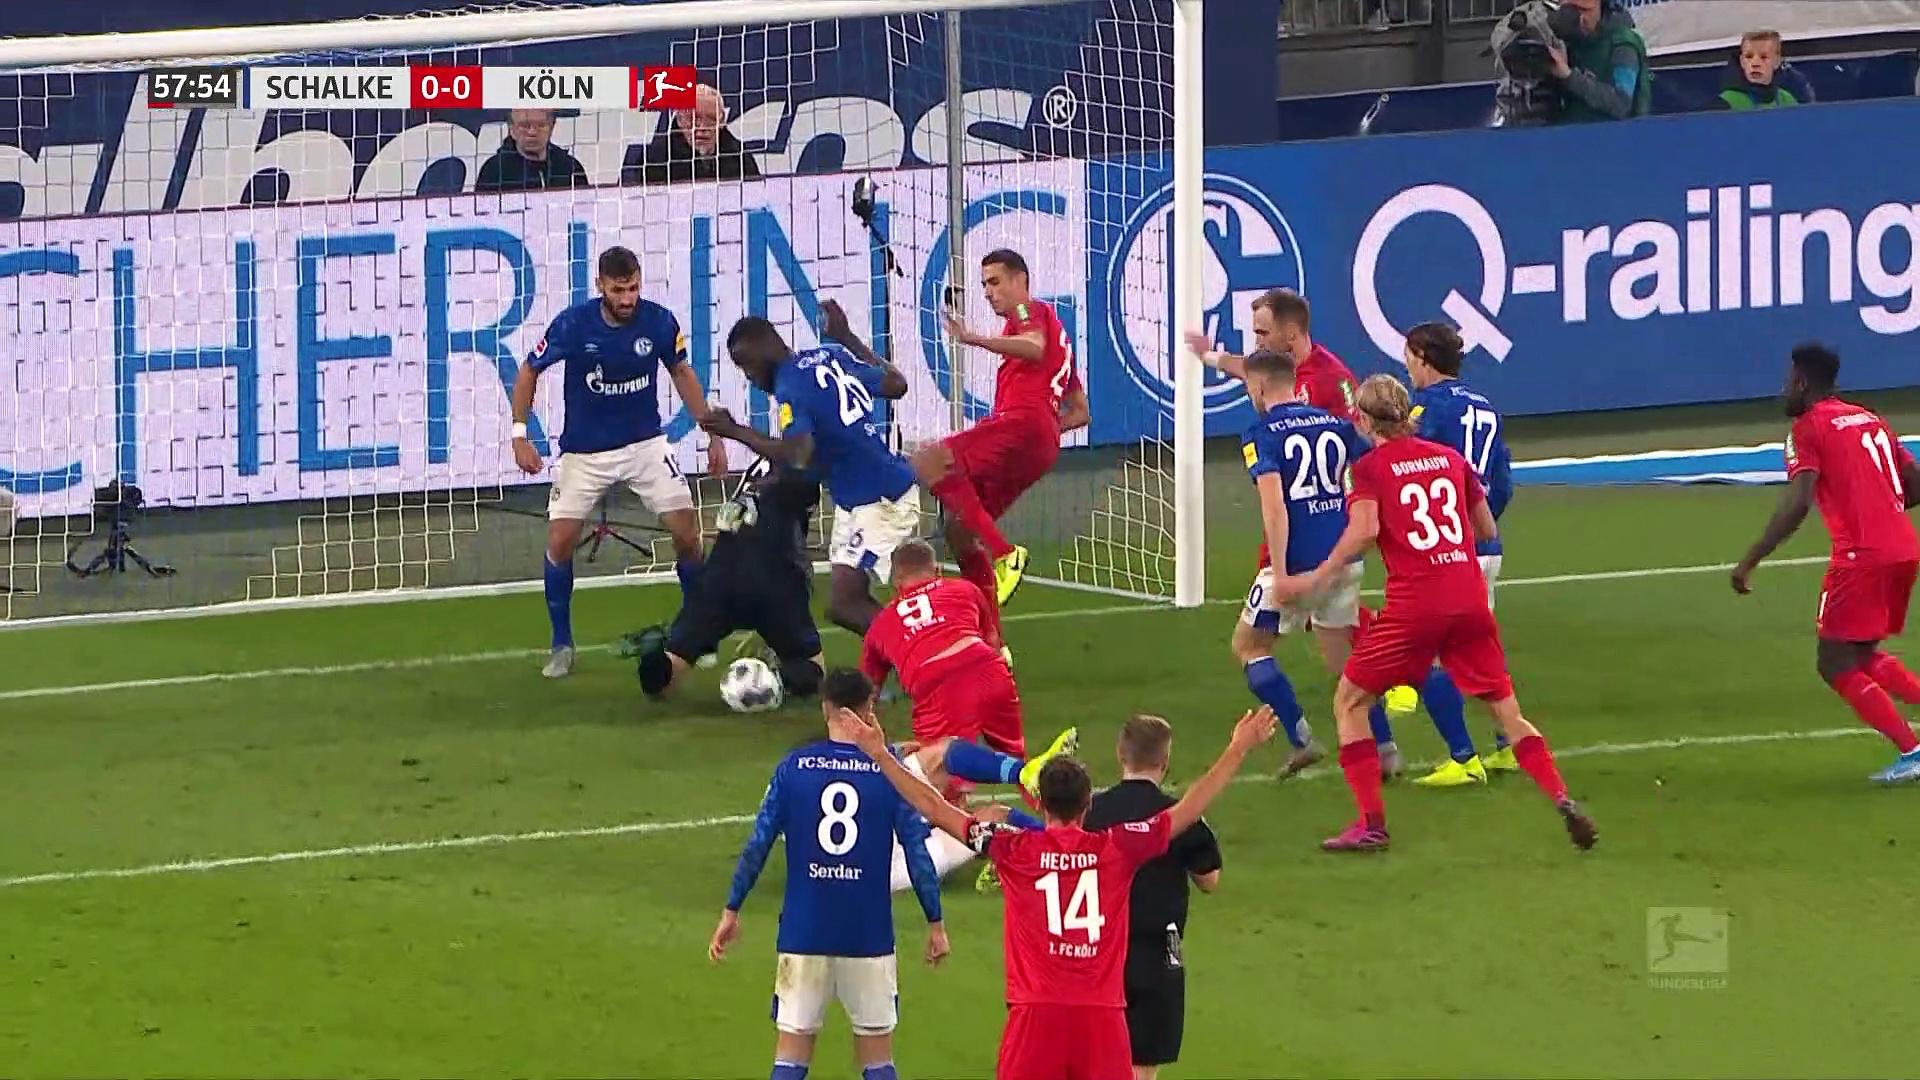 7. Hafta / Schake 04 - Köln: 1-1 (Özet)